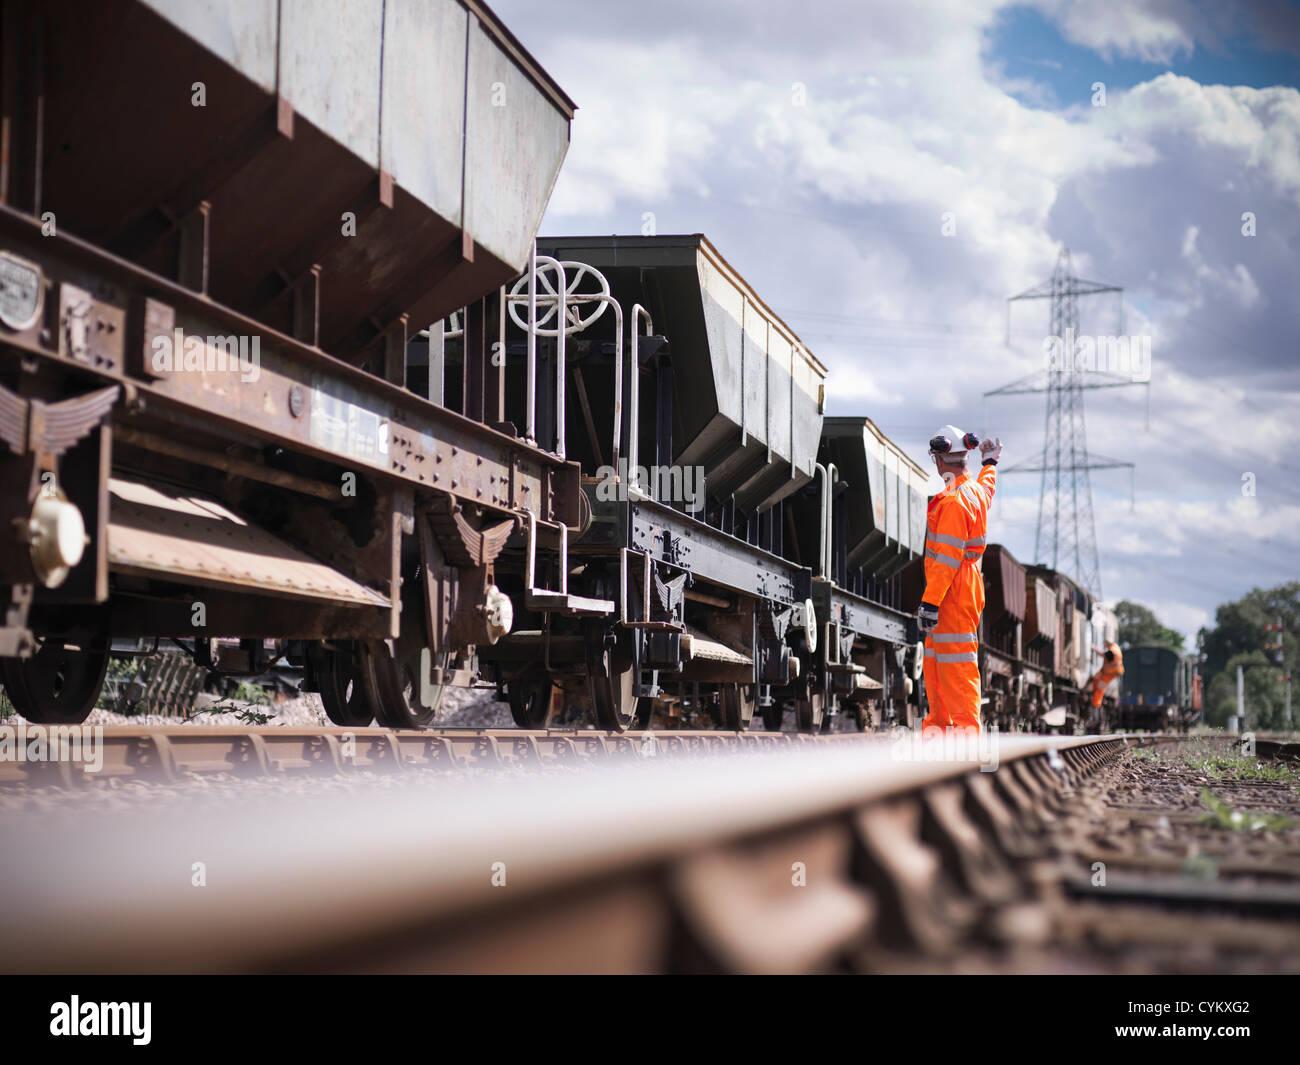 Railway workers signaling train - Stock Image